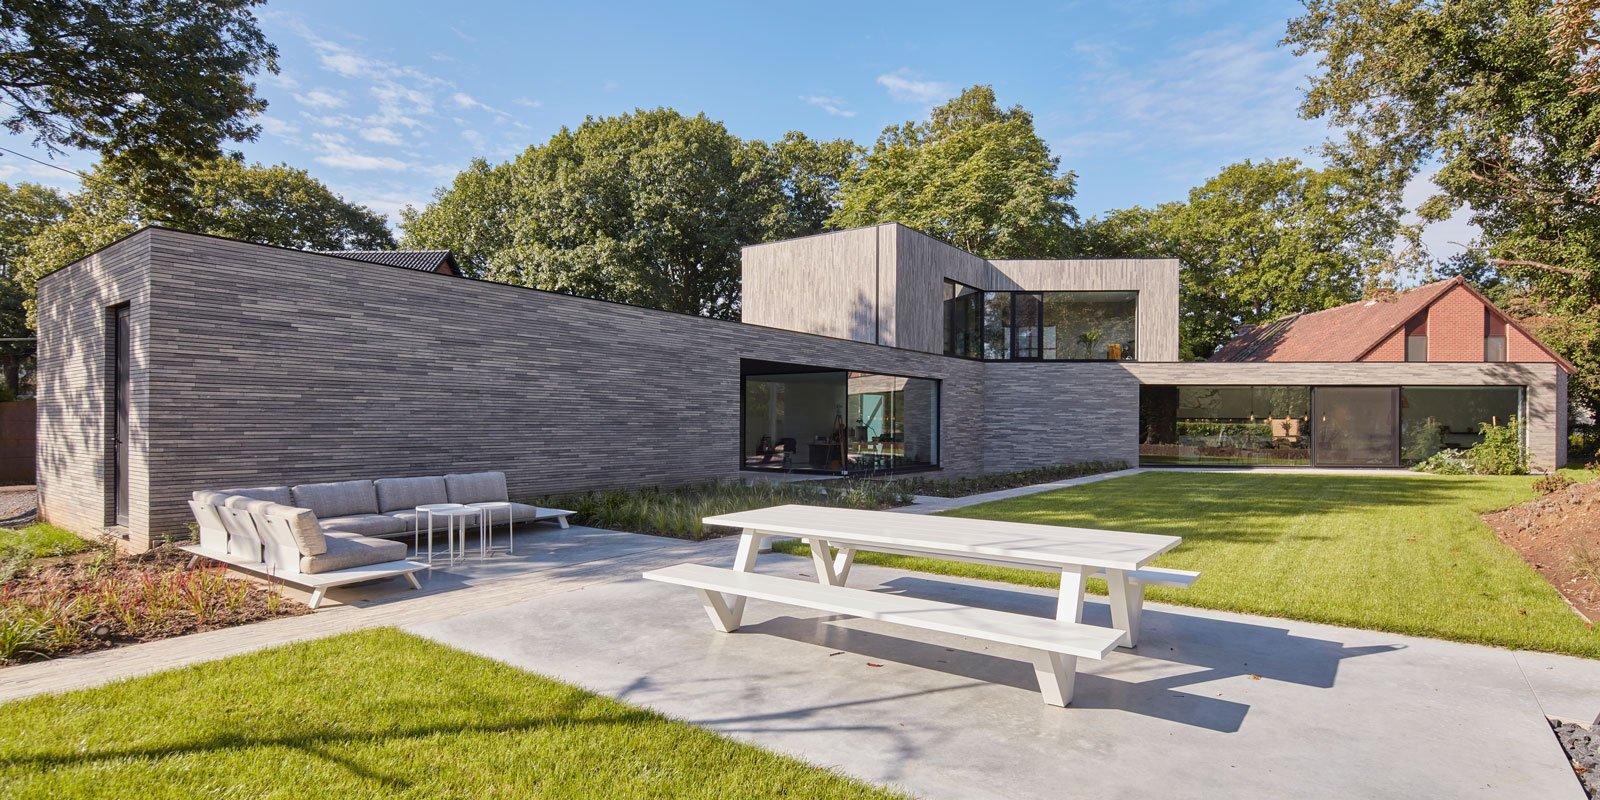 Hedendaagse villa | Studio Segers, the art of living